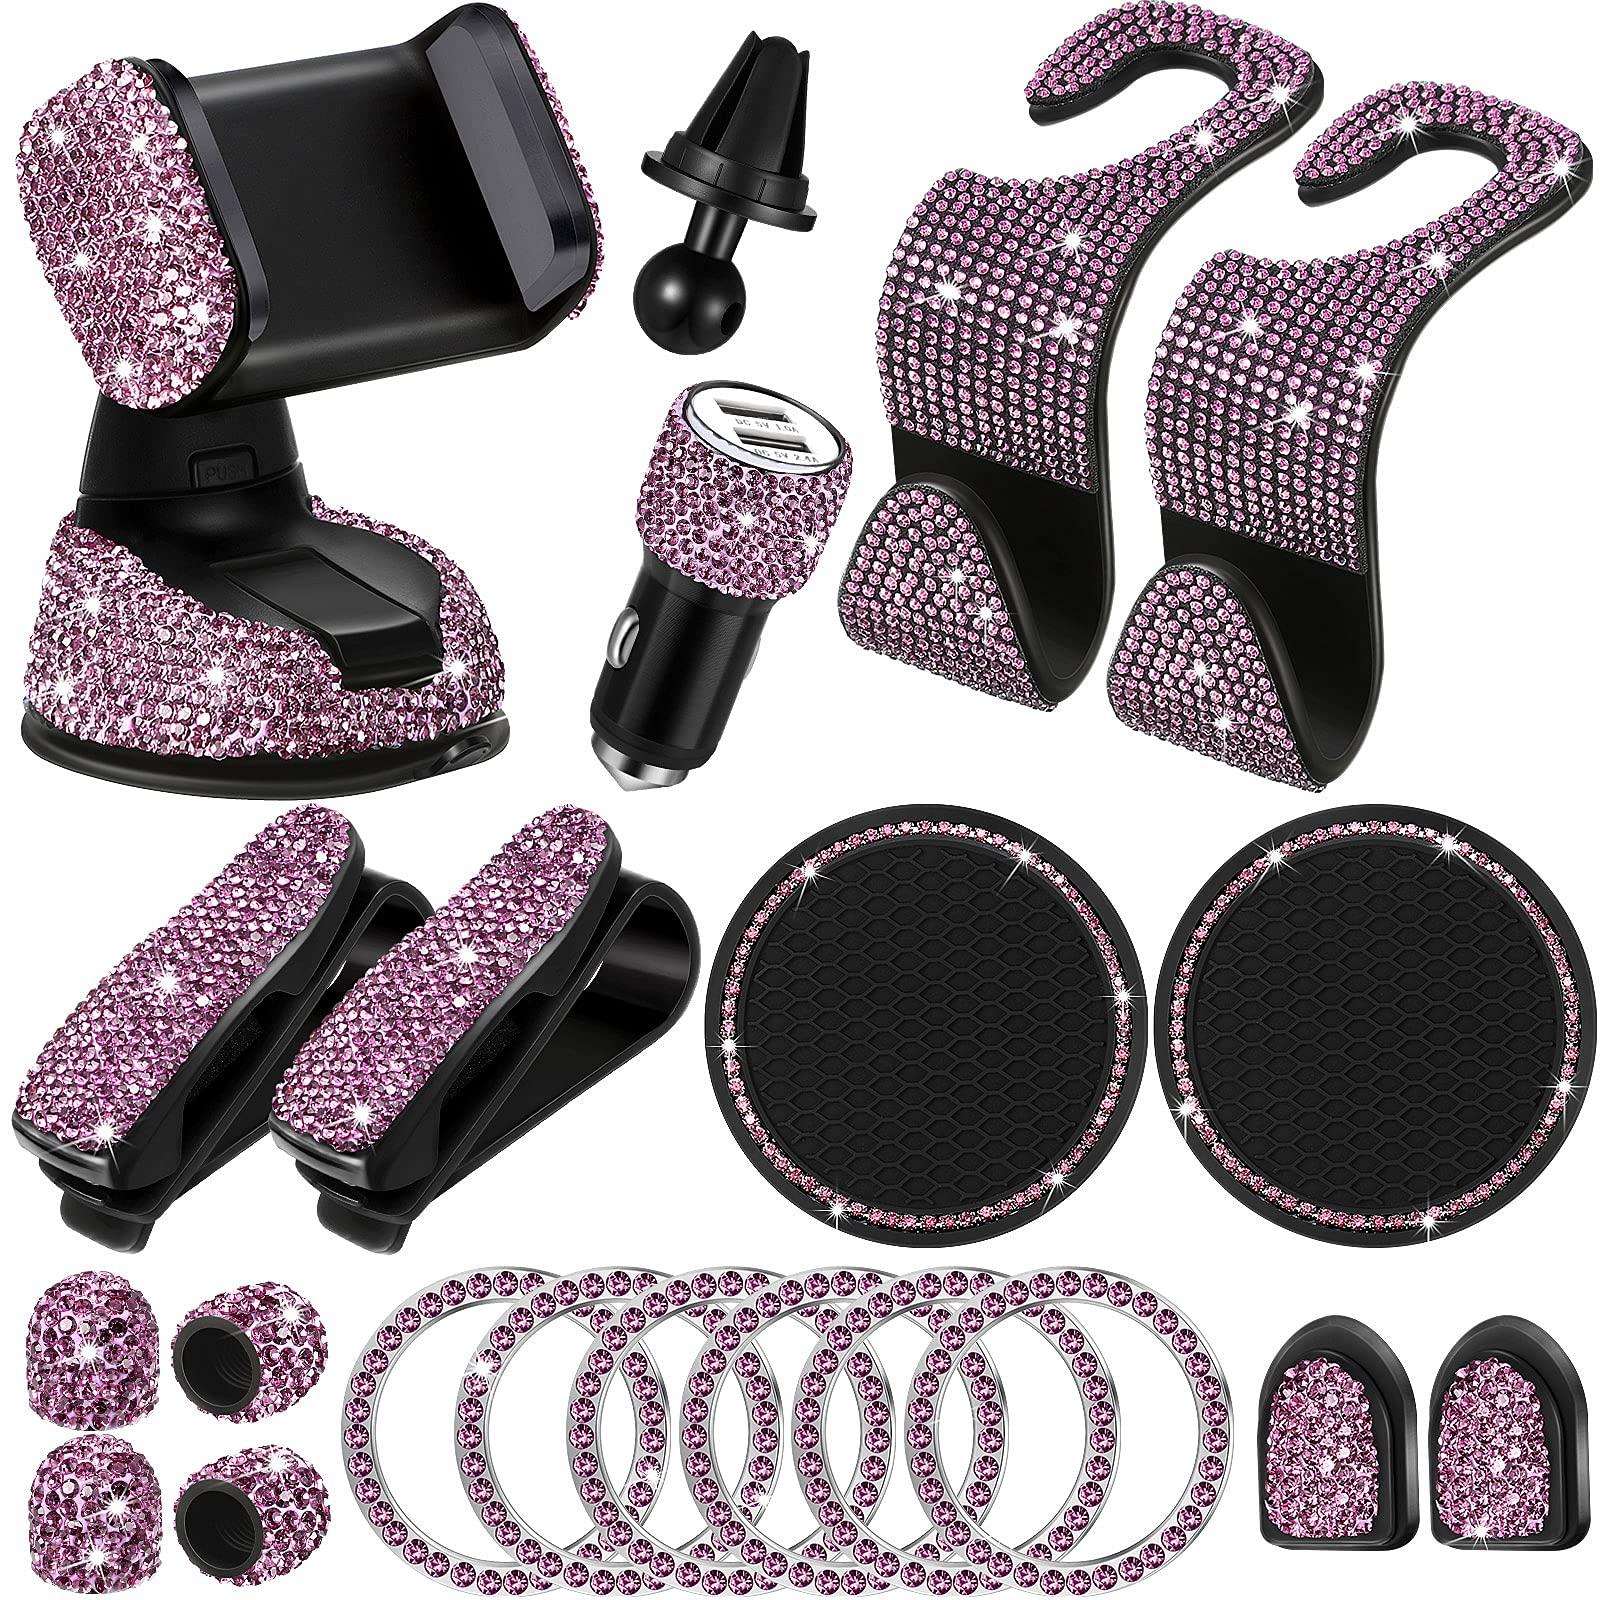 20 Pieces Bling Car Accessories Set Bling Car Phone Holder Mount, Bling Car Headrest Collars Rings, Bling Auto Hooks, Bling Dual USB Car Charger, Bling Glasses Holder for Women (Purple)